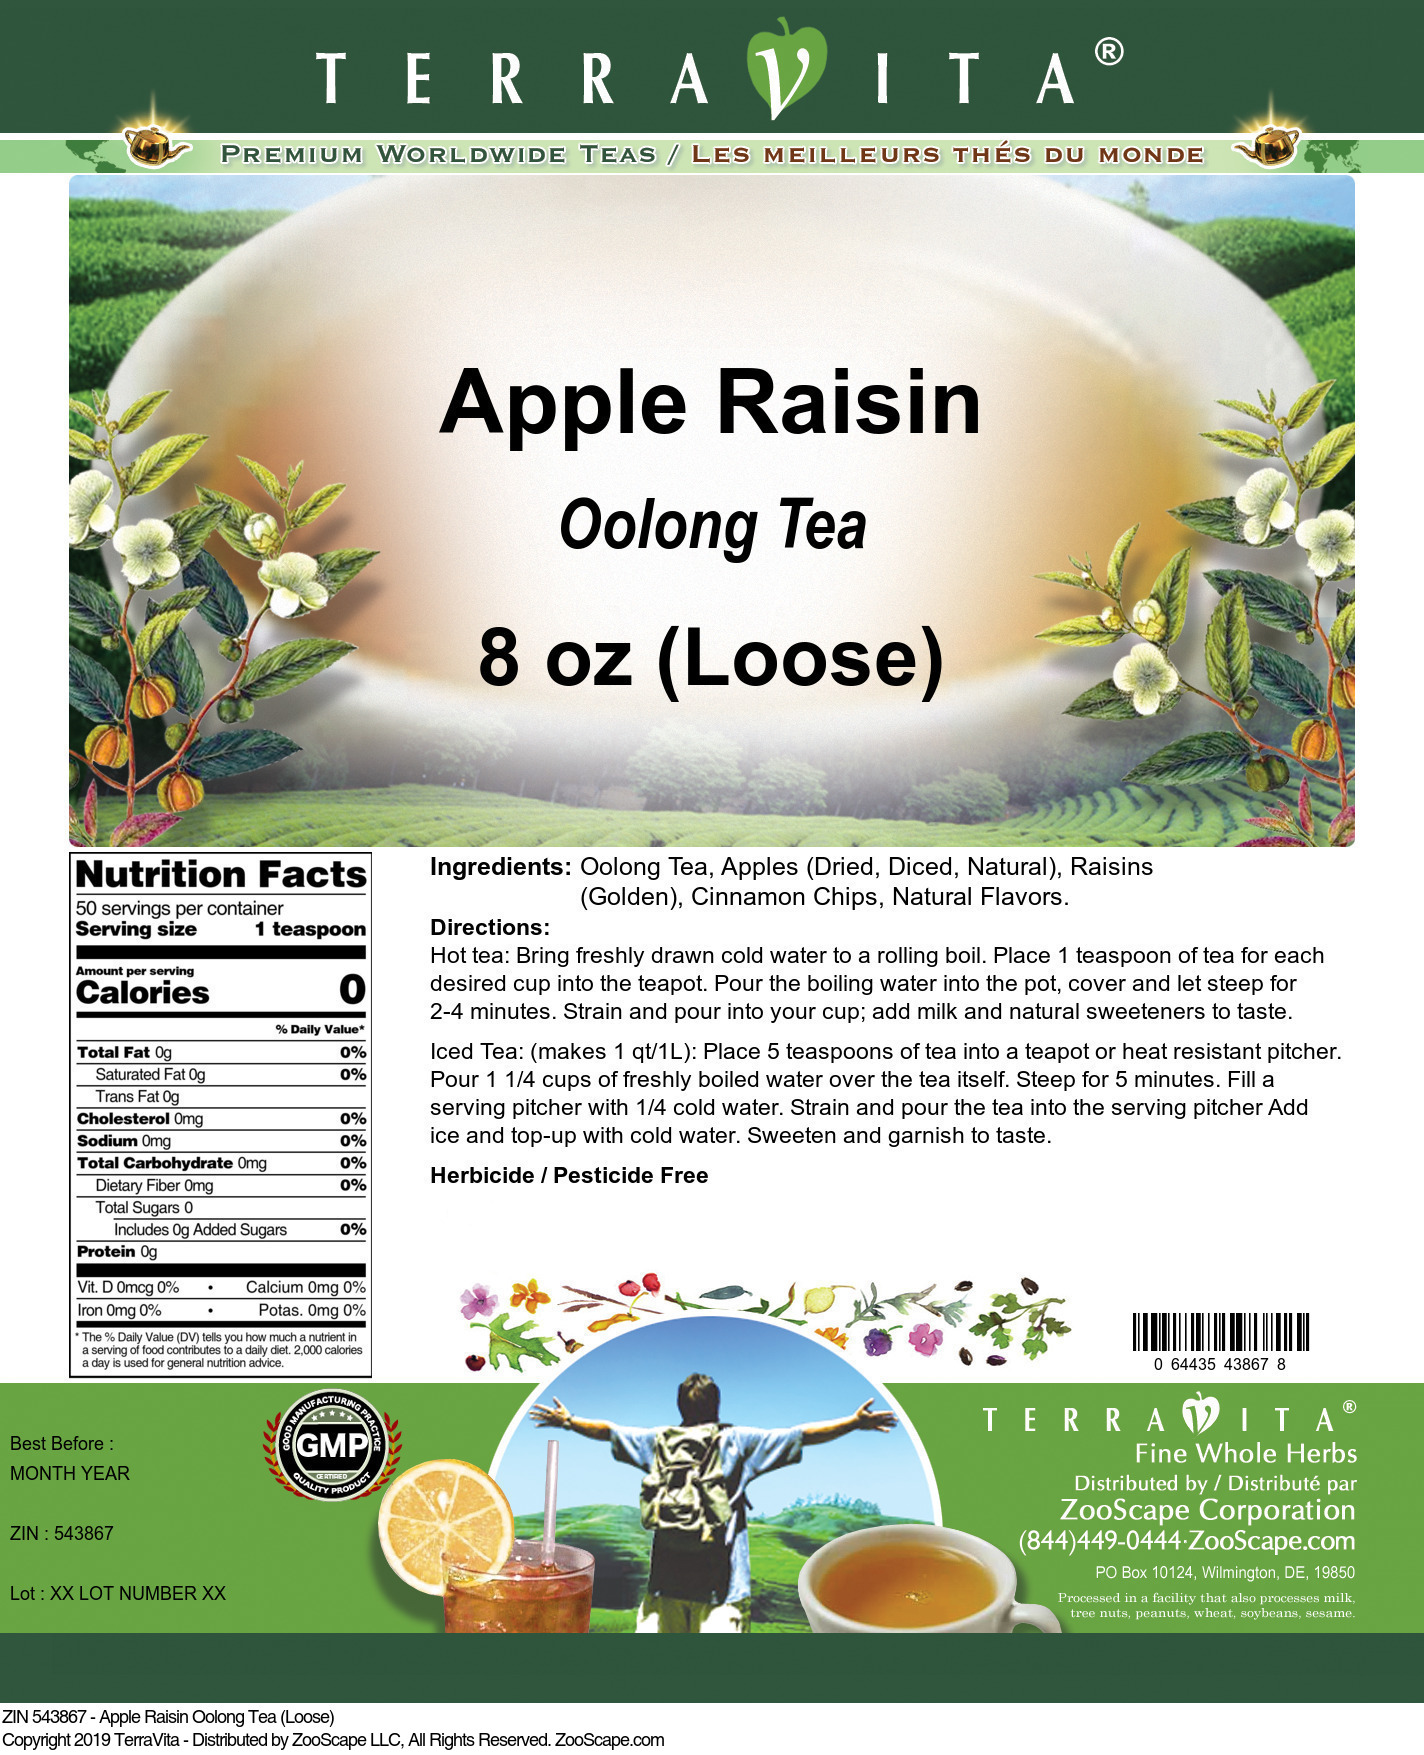 Apple Raisin Oolong Tea (Loose)